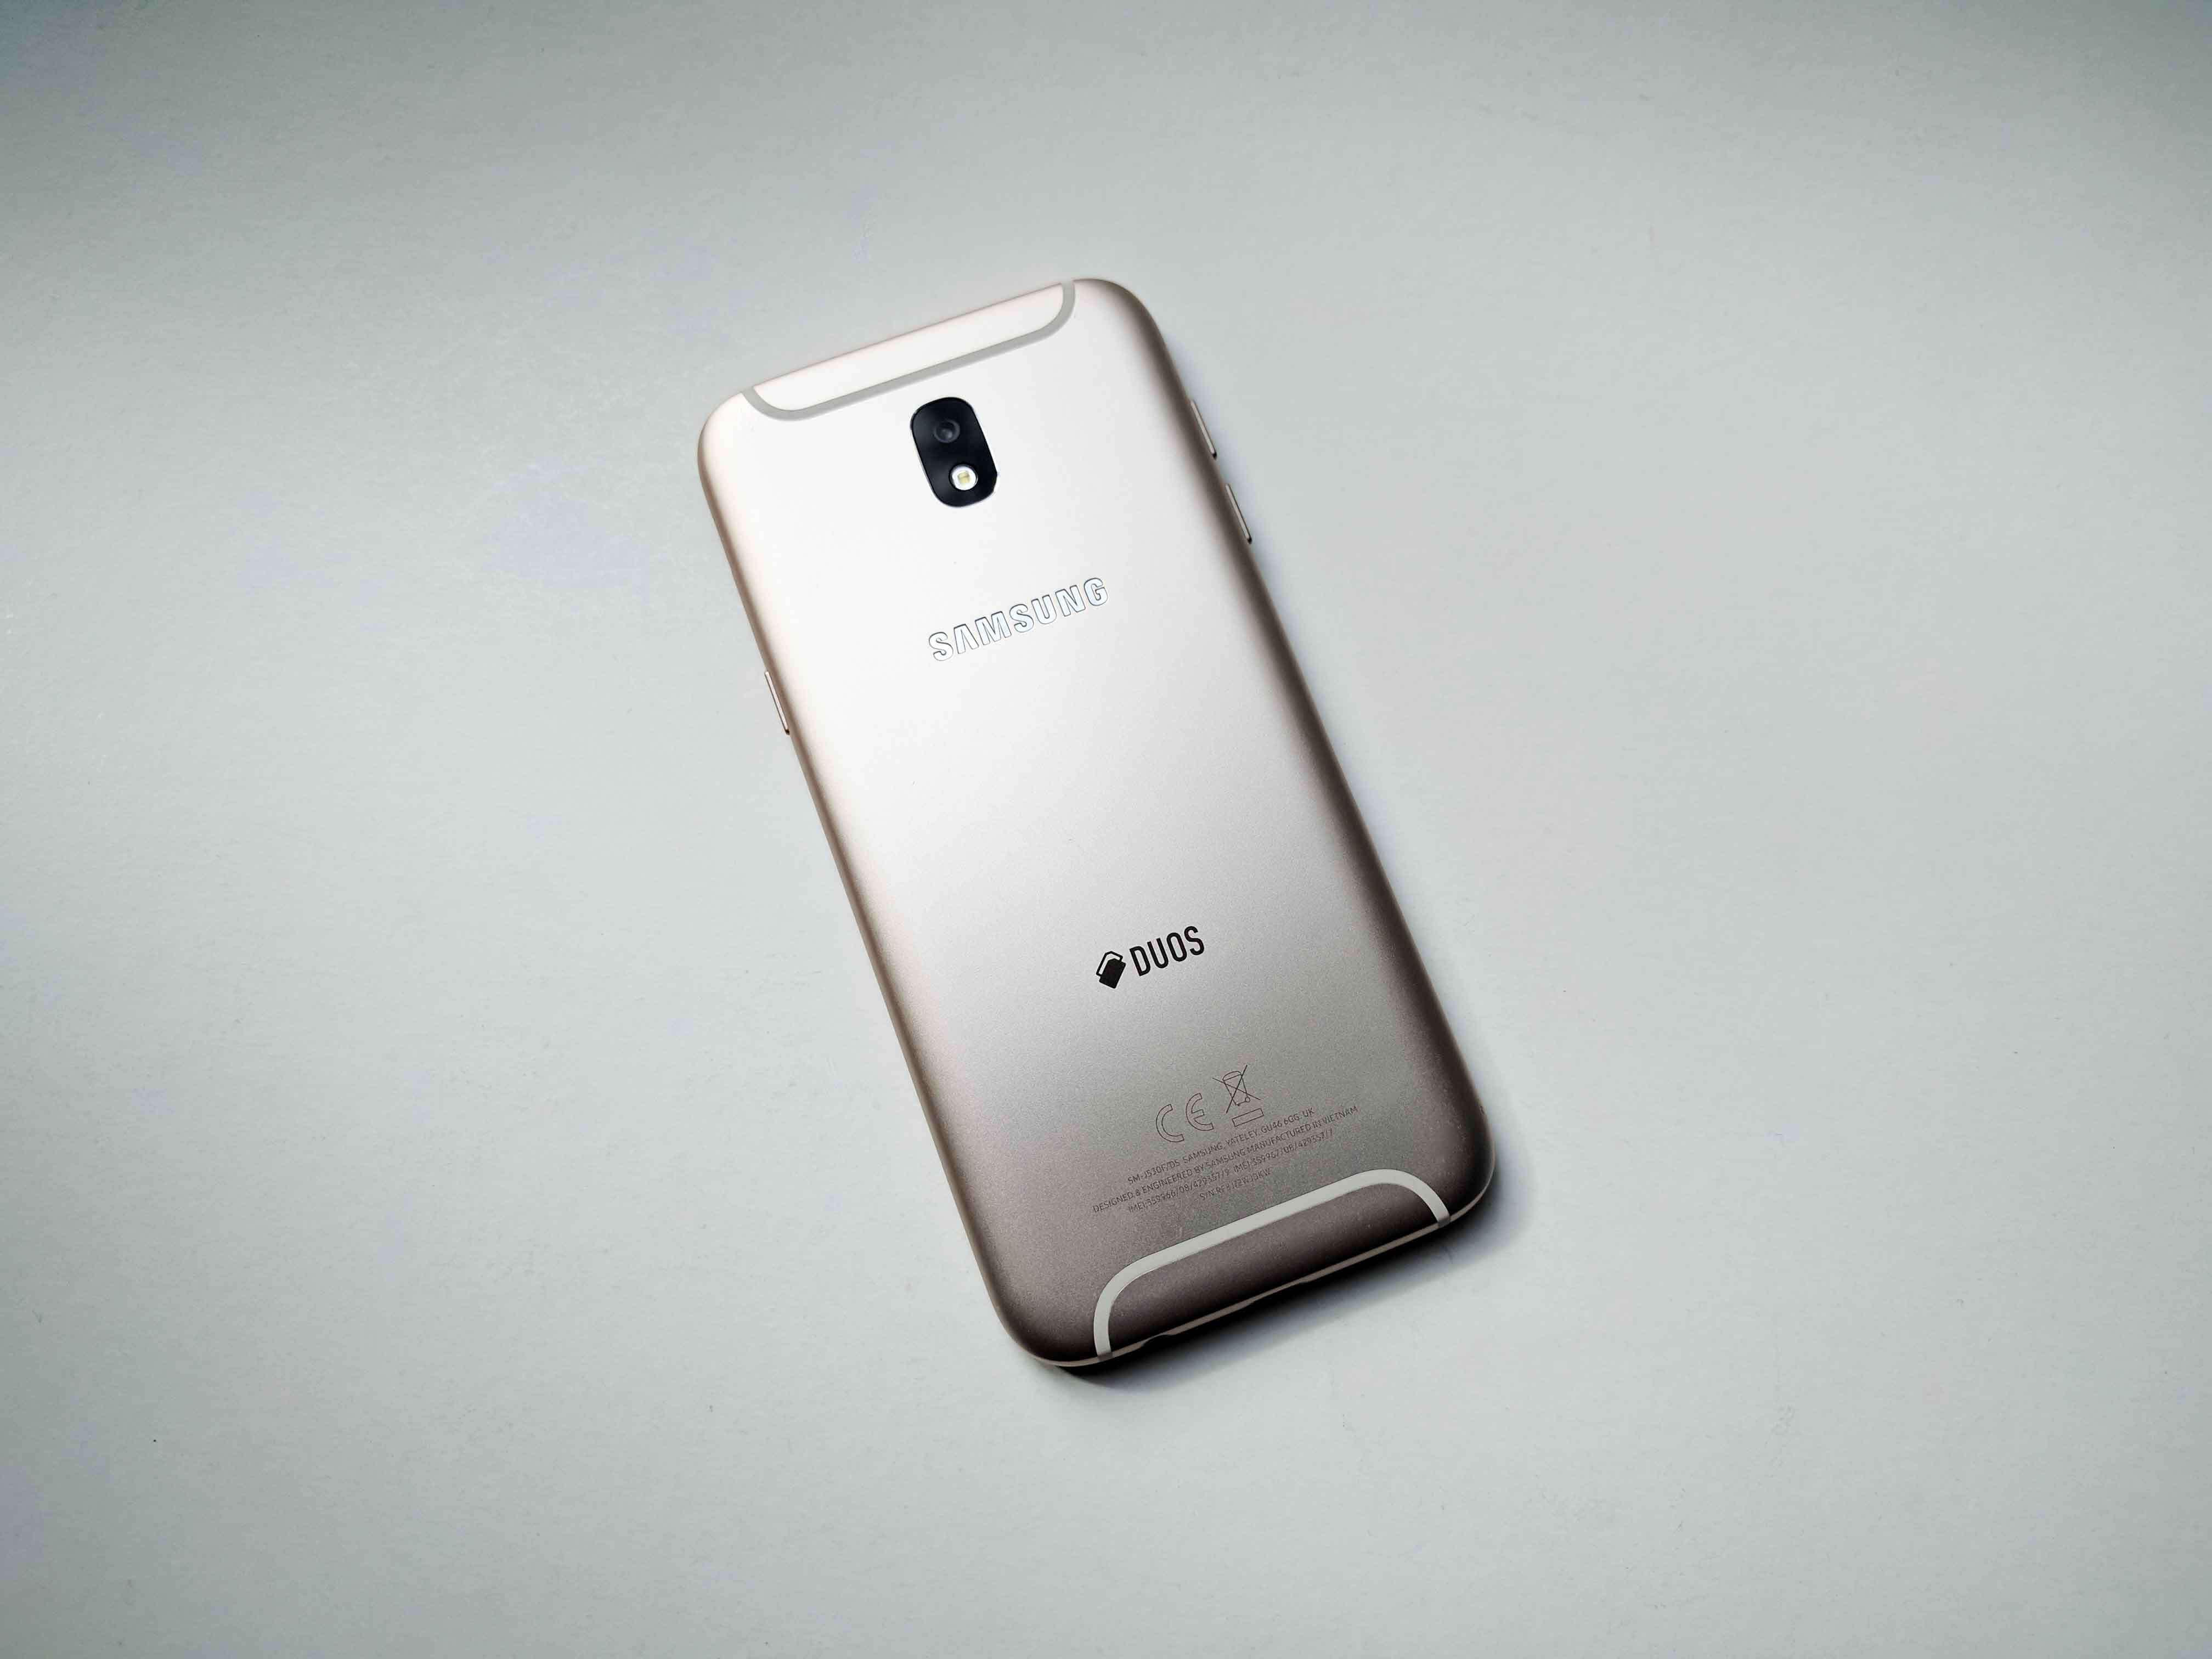 Samsung Galaxy J5 (2017) Review Romana, Pareri - foto 3